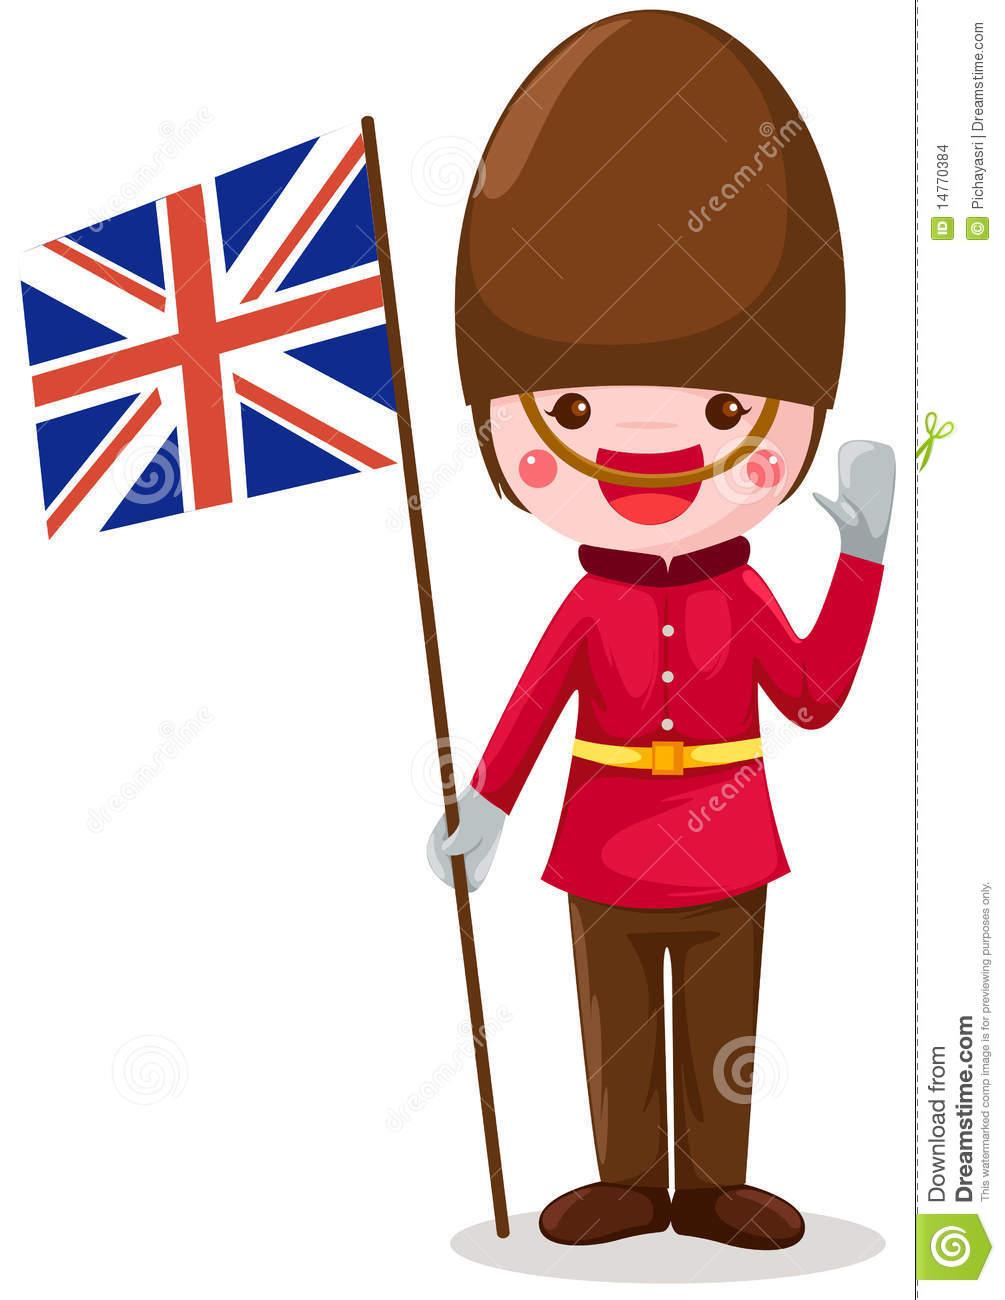 United kingdom clipart banner transparent United Kingdom Flag Clipart - Clipart Kid banner transparent